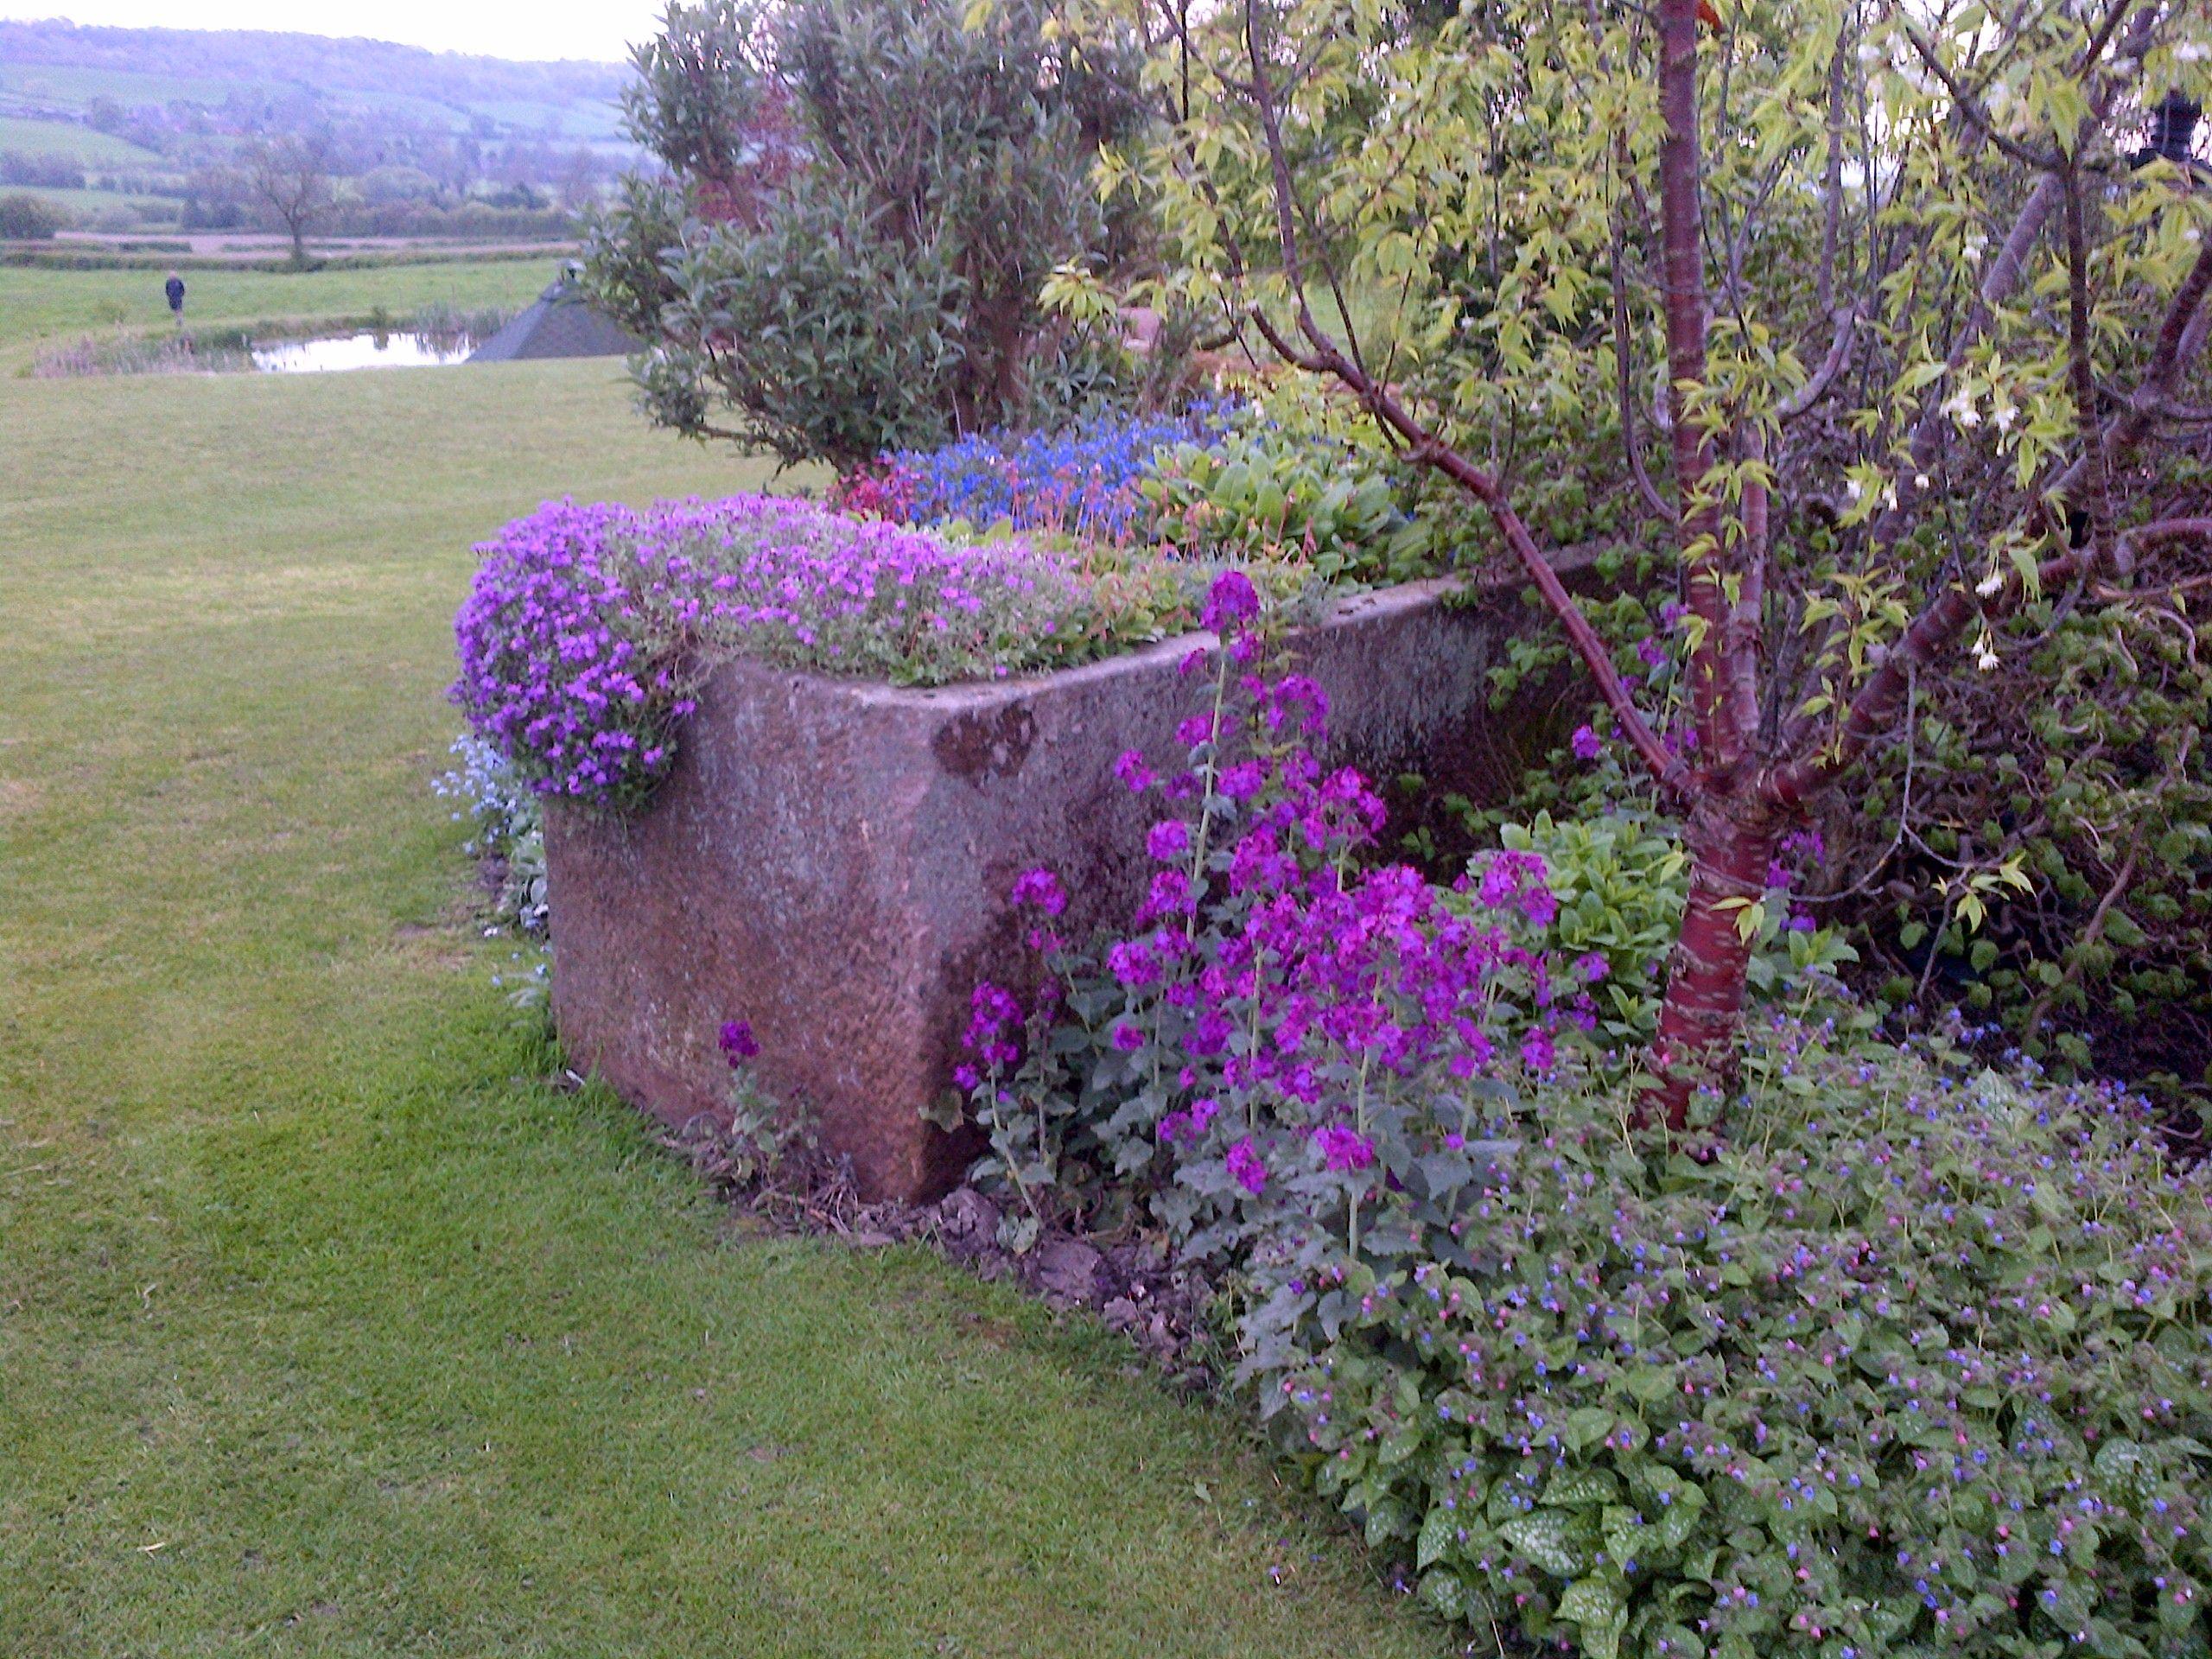 Charity open gardens near Ashbourne, Derbyshire open